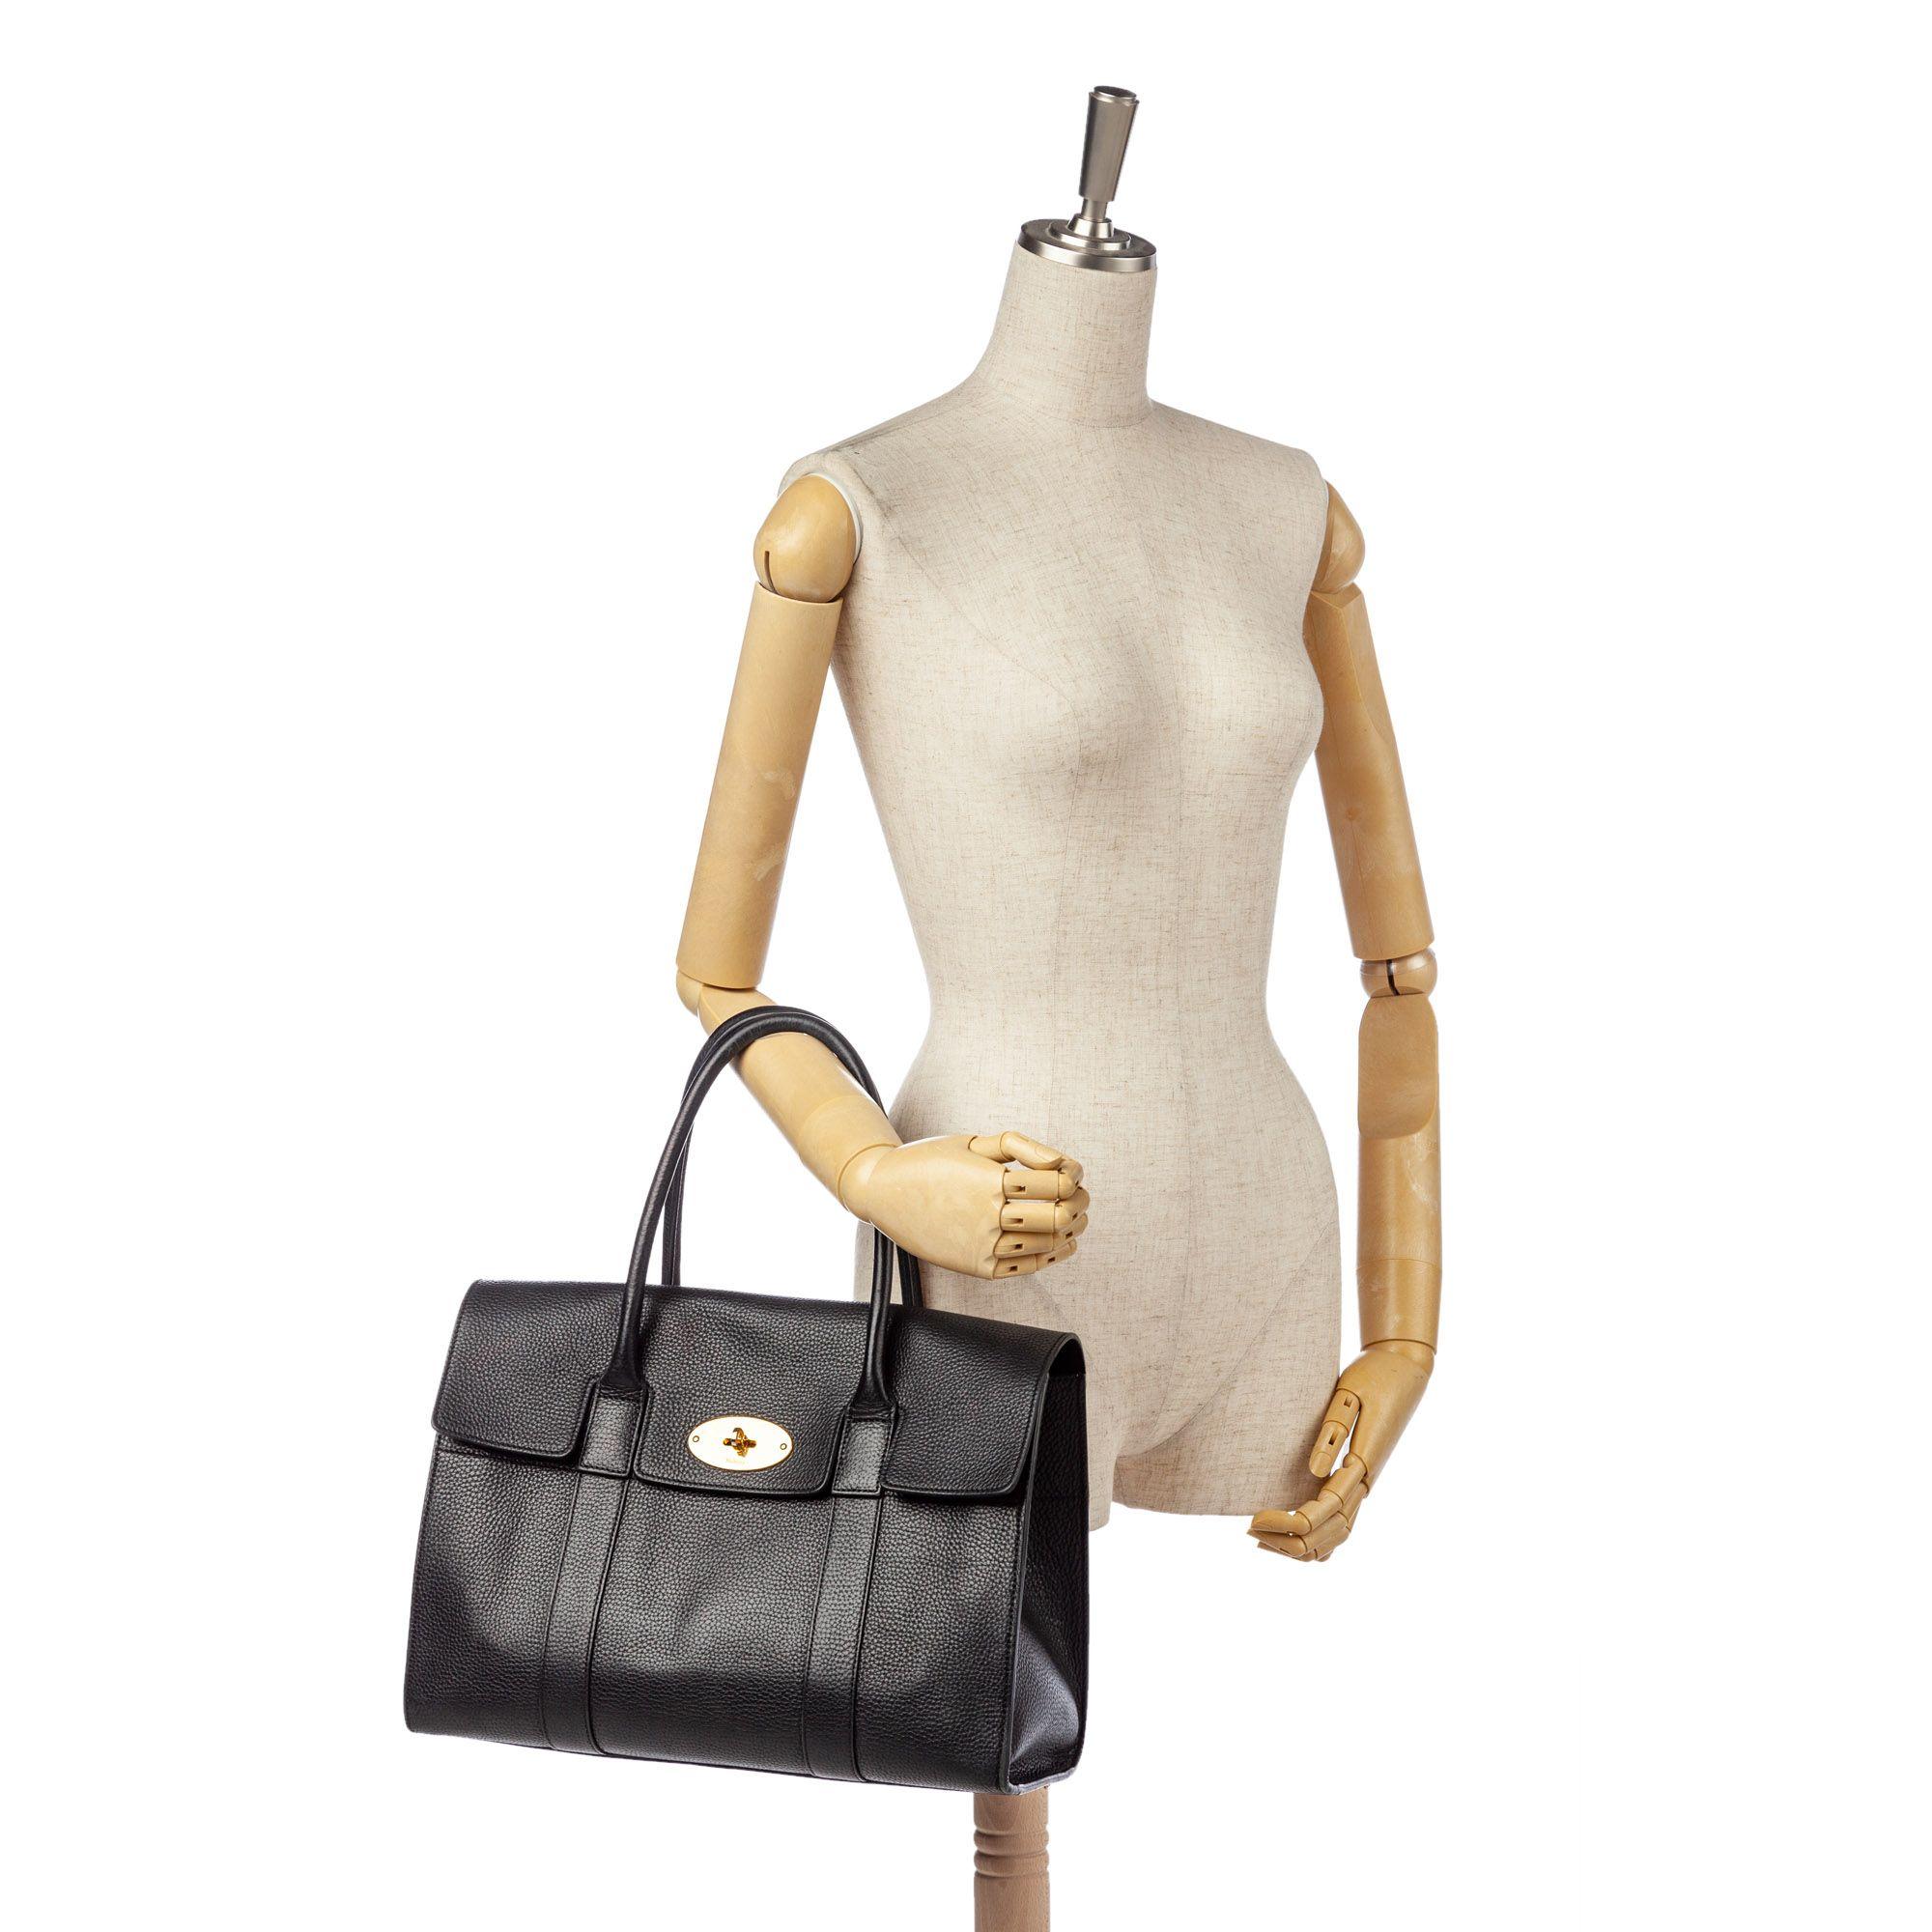 Vintage Mulberry Bayswater Leather Handbag Black